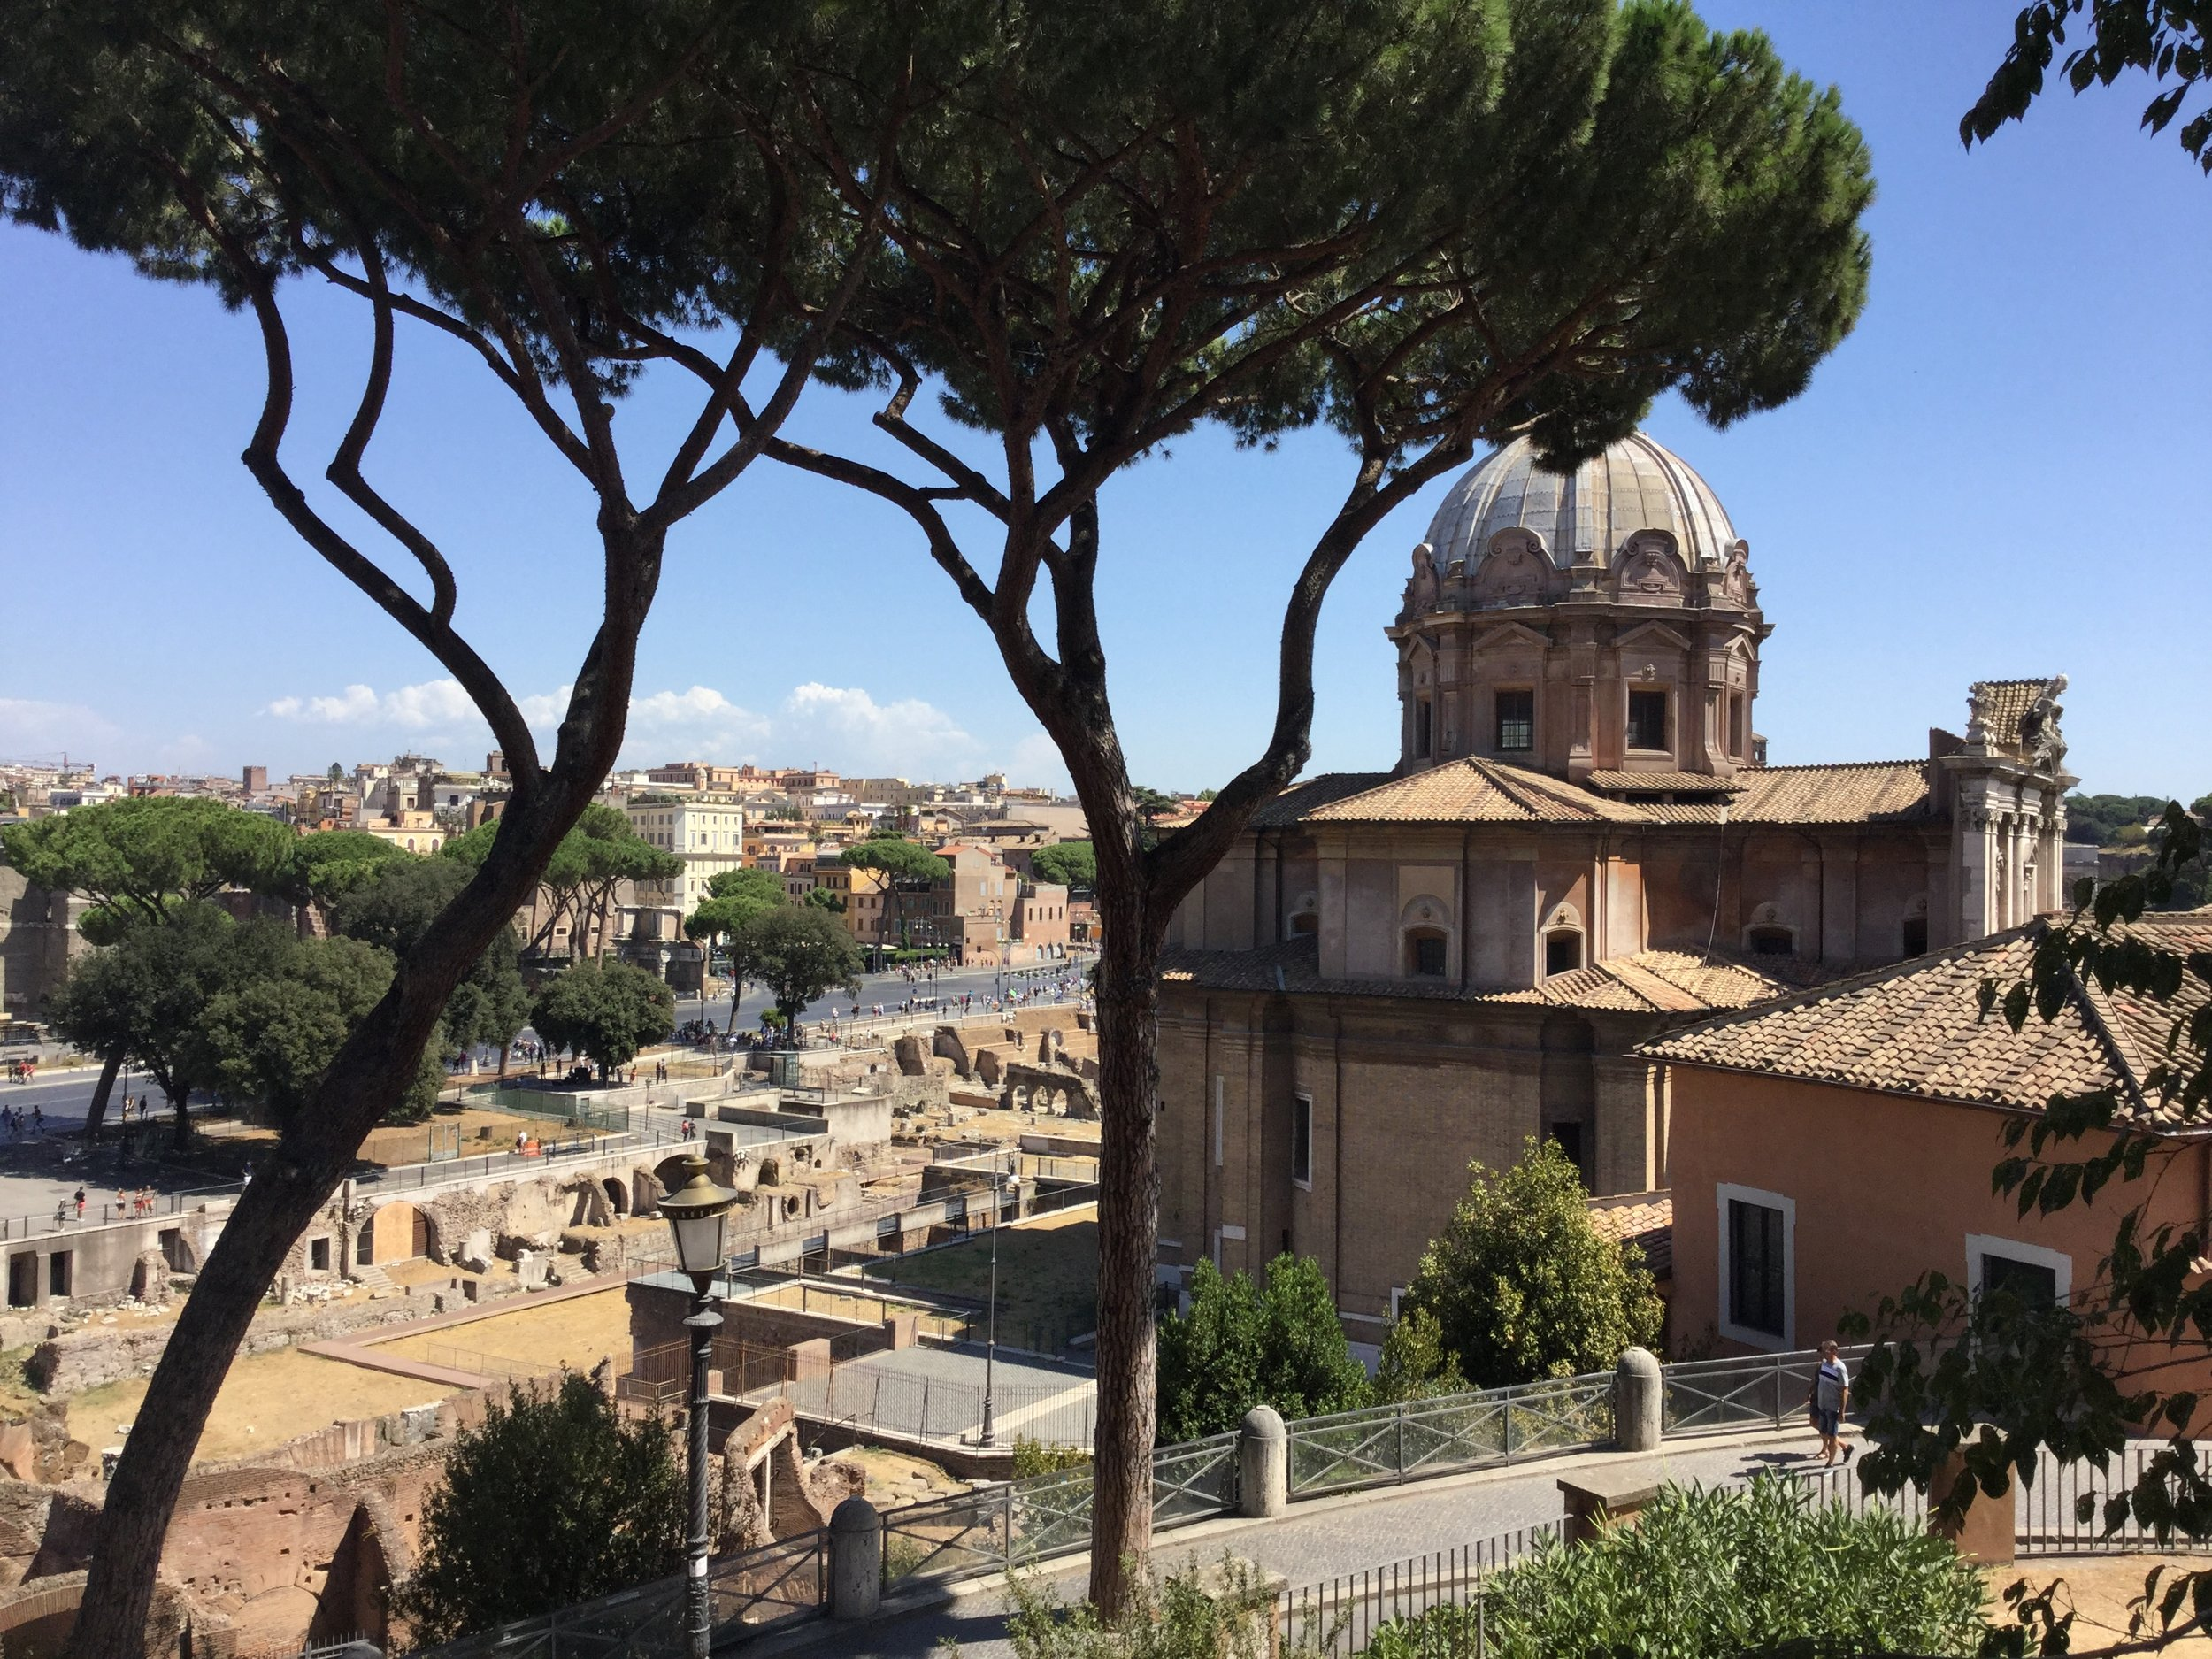 View from Il Campidoglio.